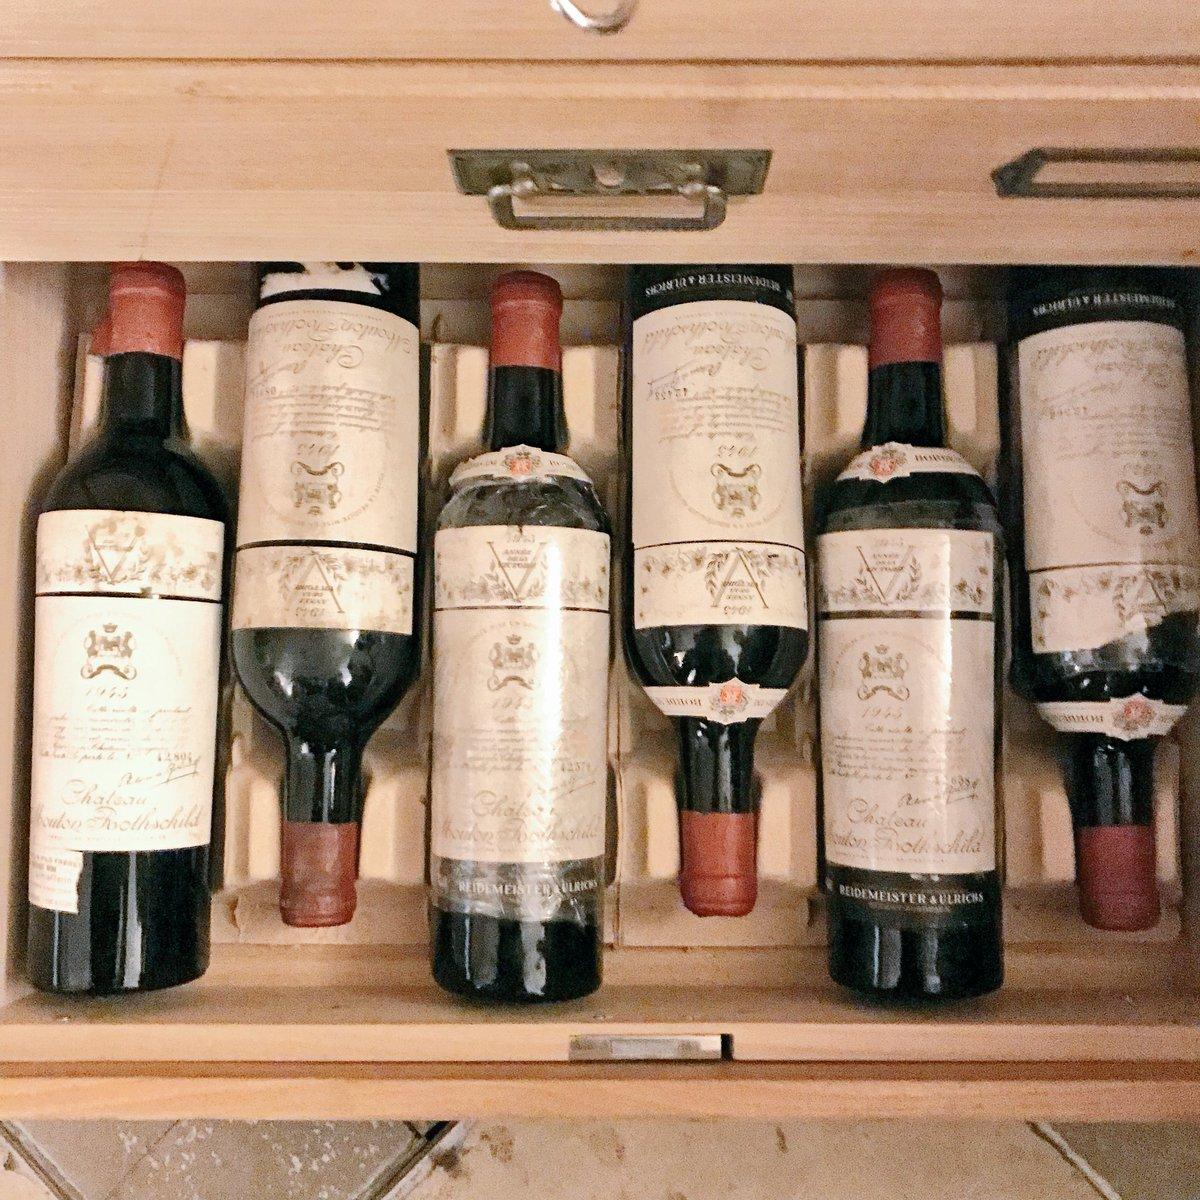 Palais Colberg Vienna 60000 Bottles Approx Worth EUR25m 6L Btl DRC EUR125k 82 Cheval Blanc OMG 45 Victory Ch Mouton